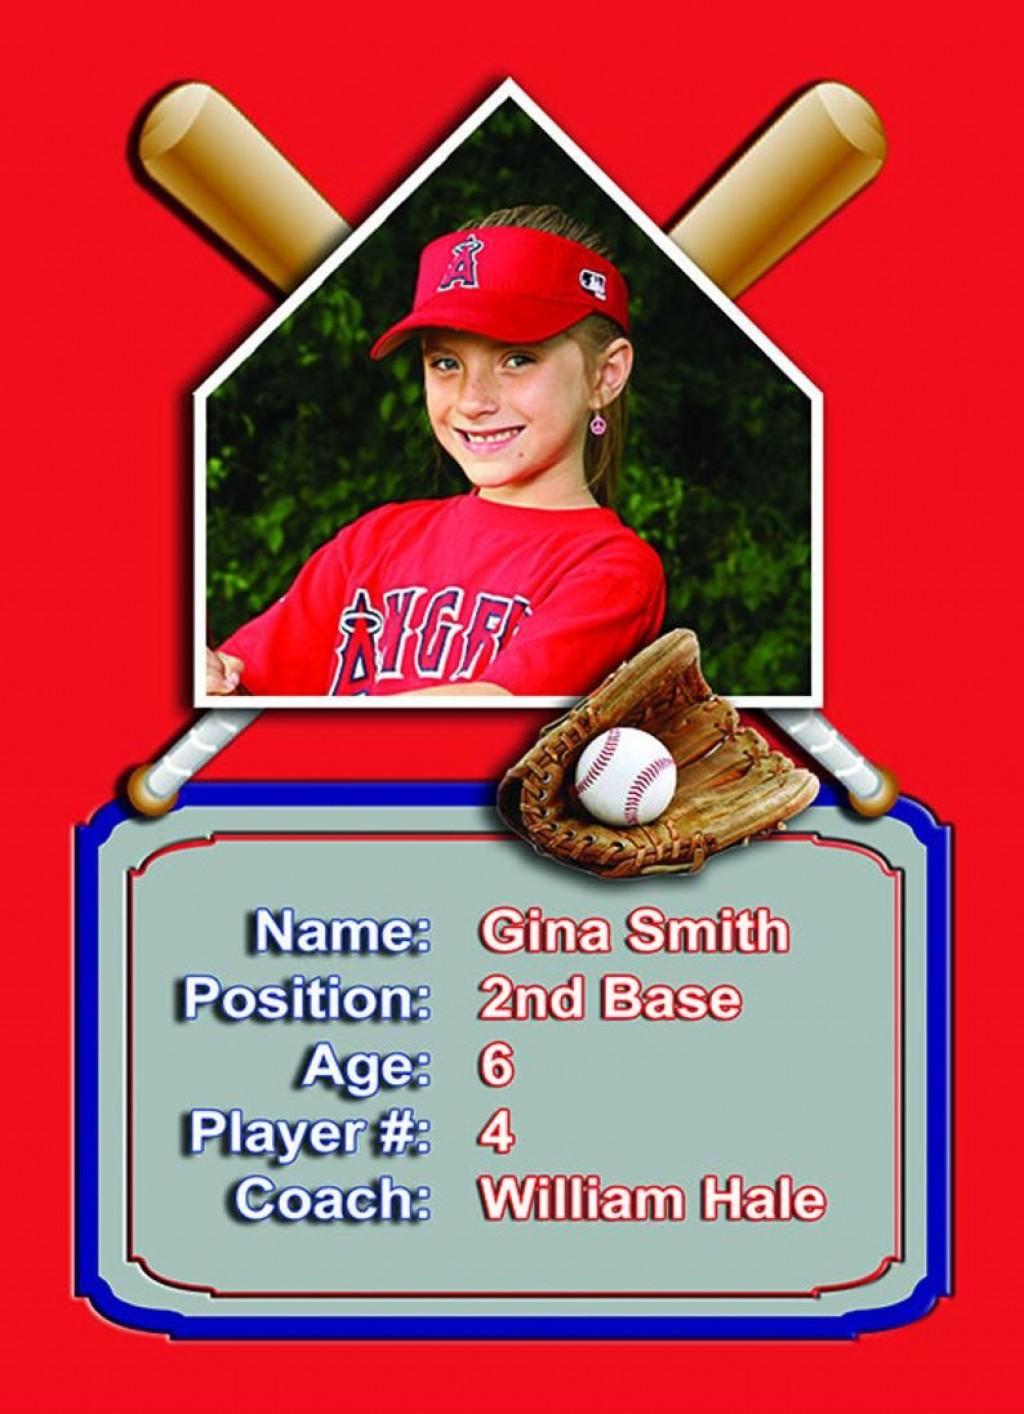 006 Imposing Photoshop Baseball Magazine Cover Template High Definition Large